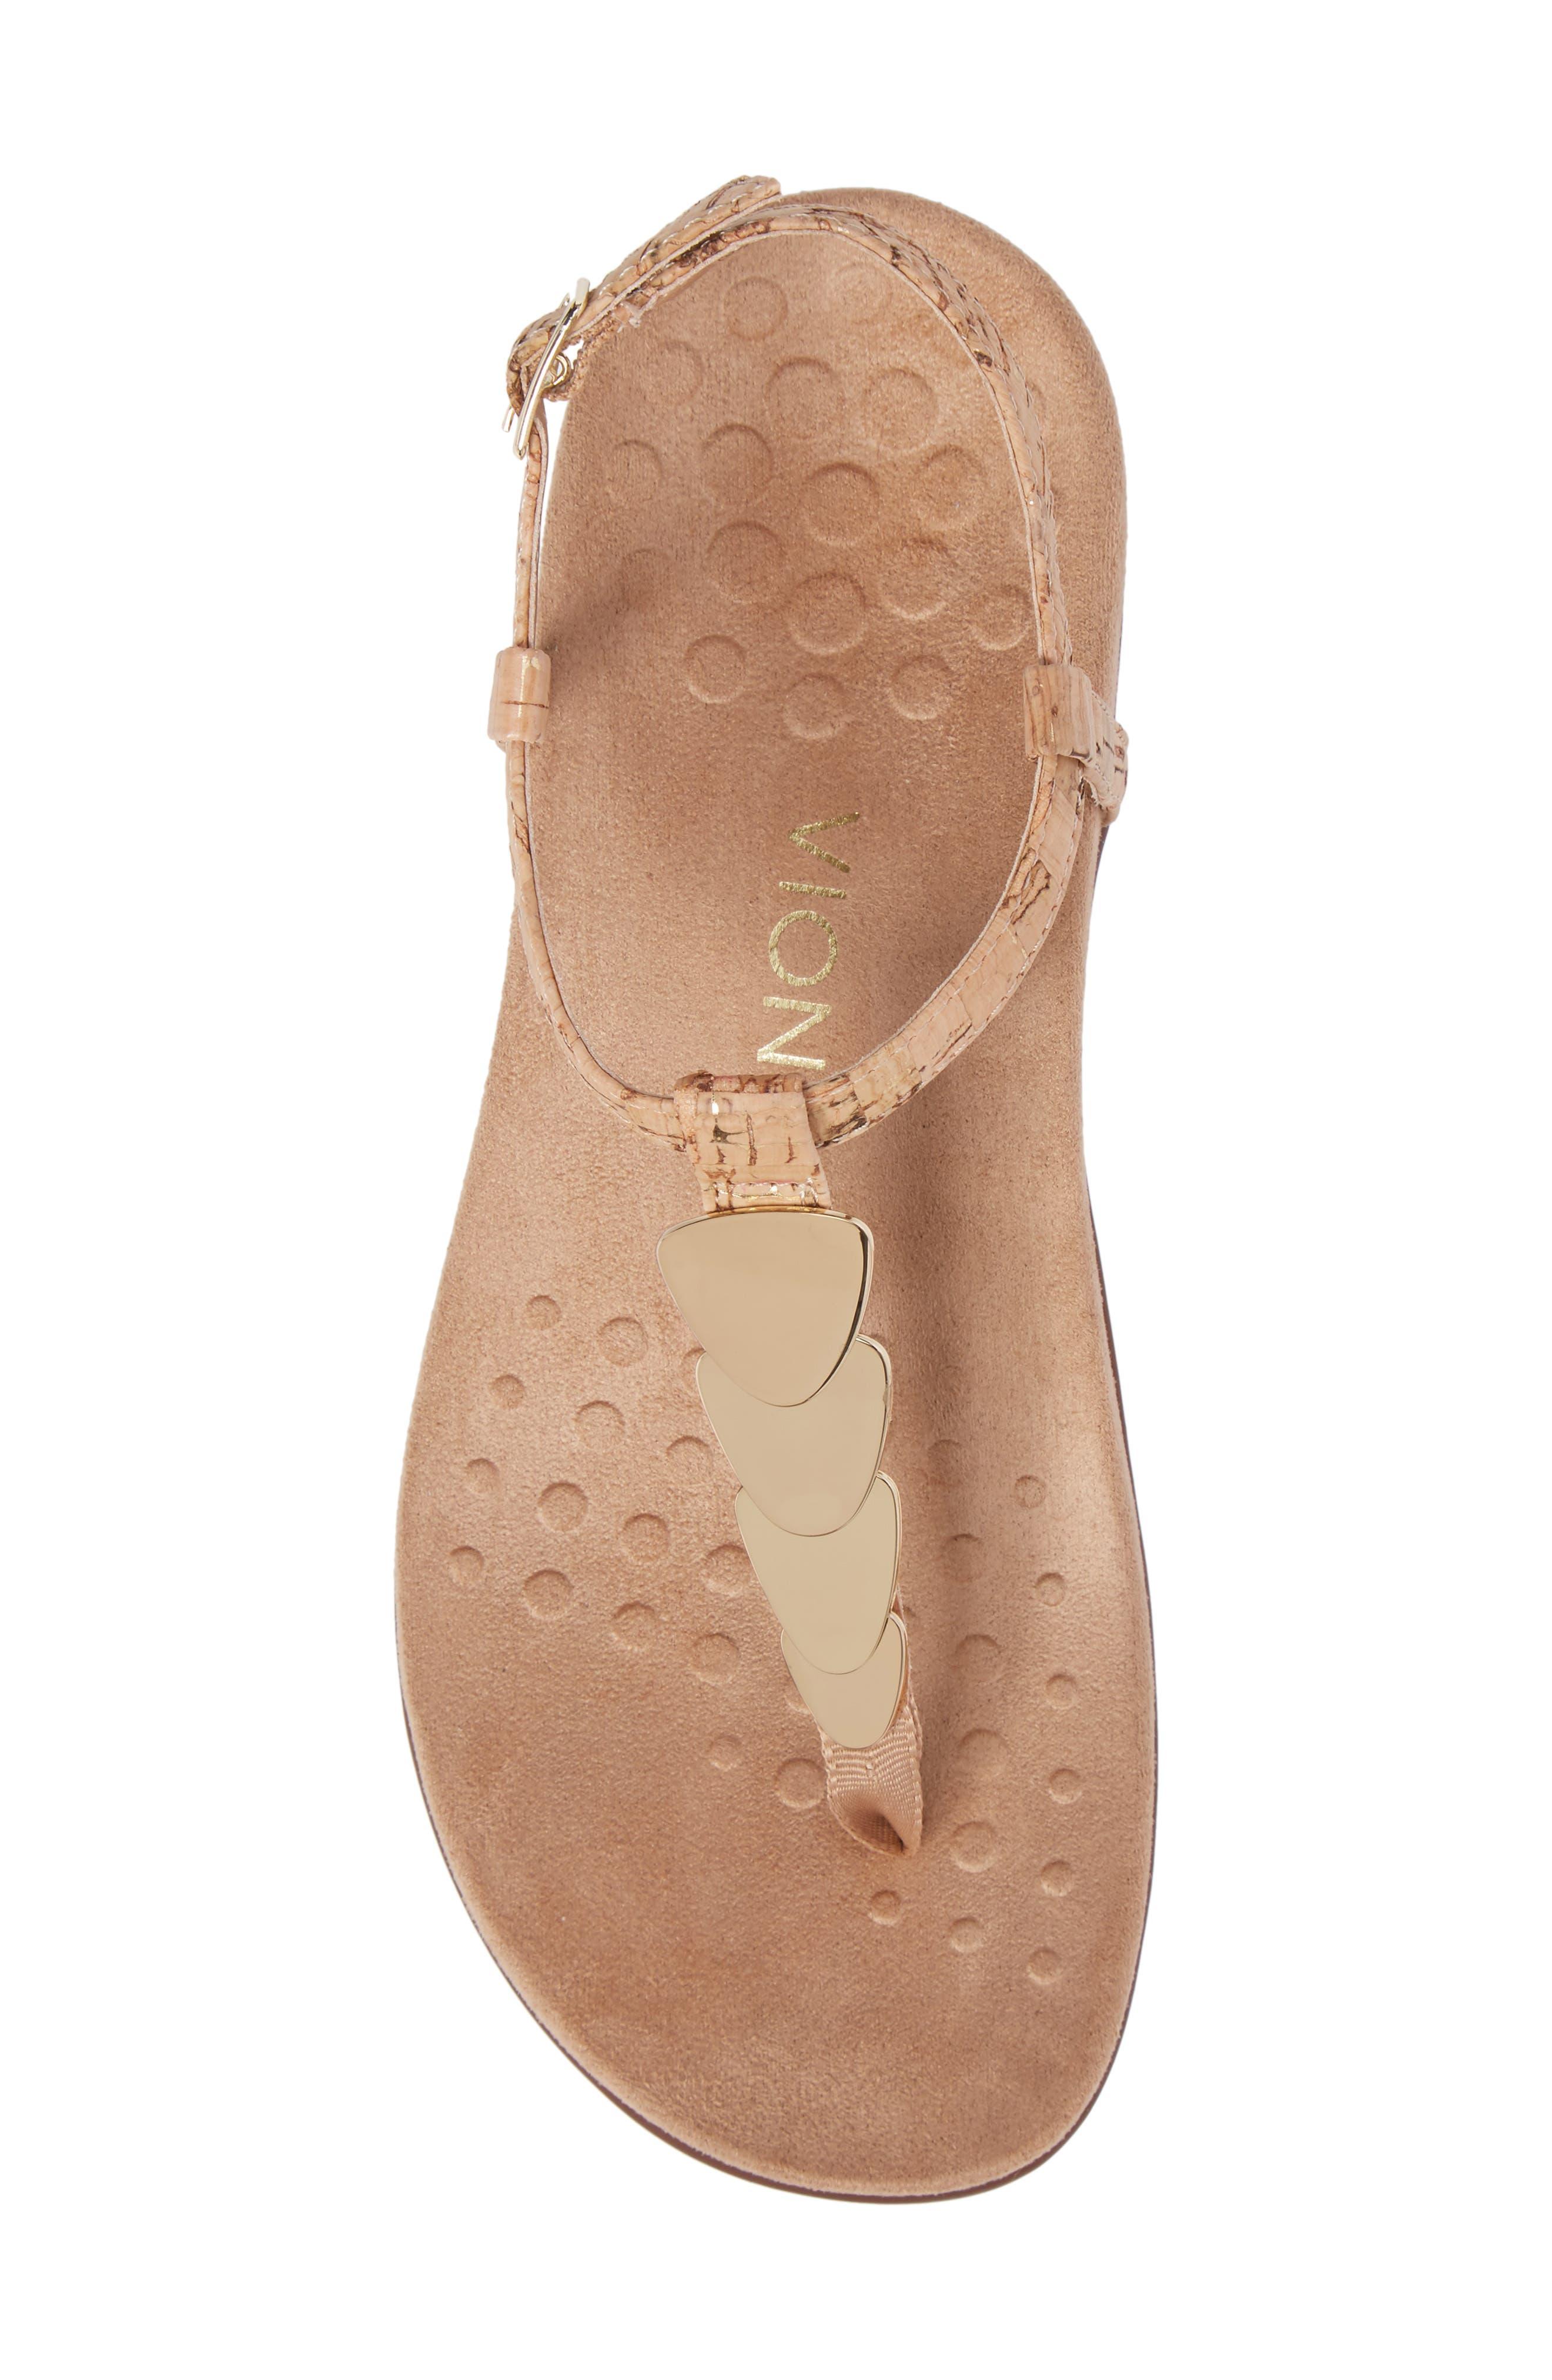 Miami T-Strap Sandal,                             Alternate thumbnail 5, color,                             Natural Cork Fabric